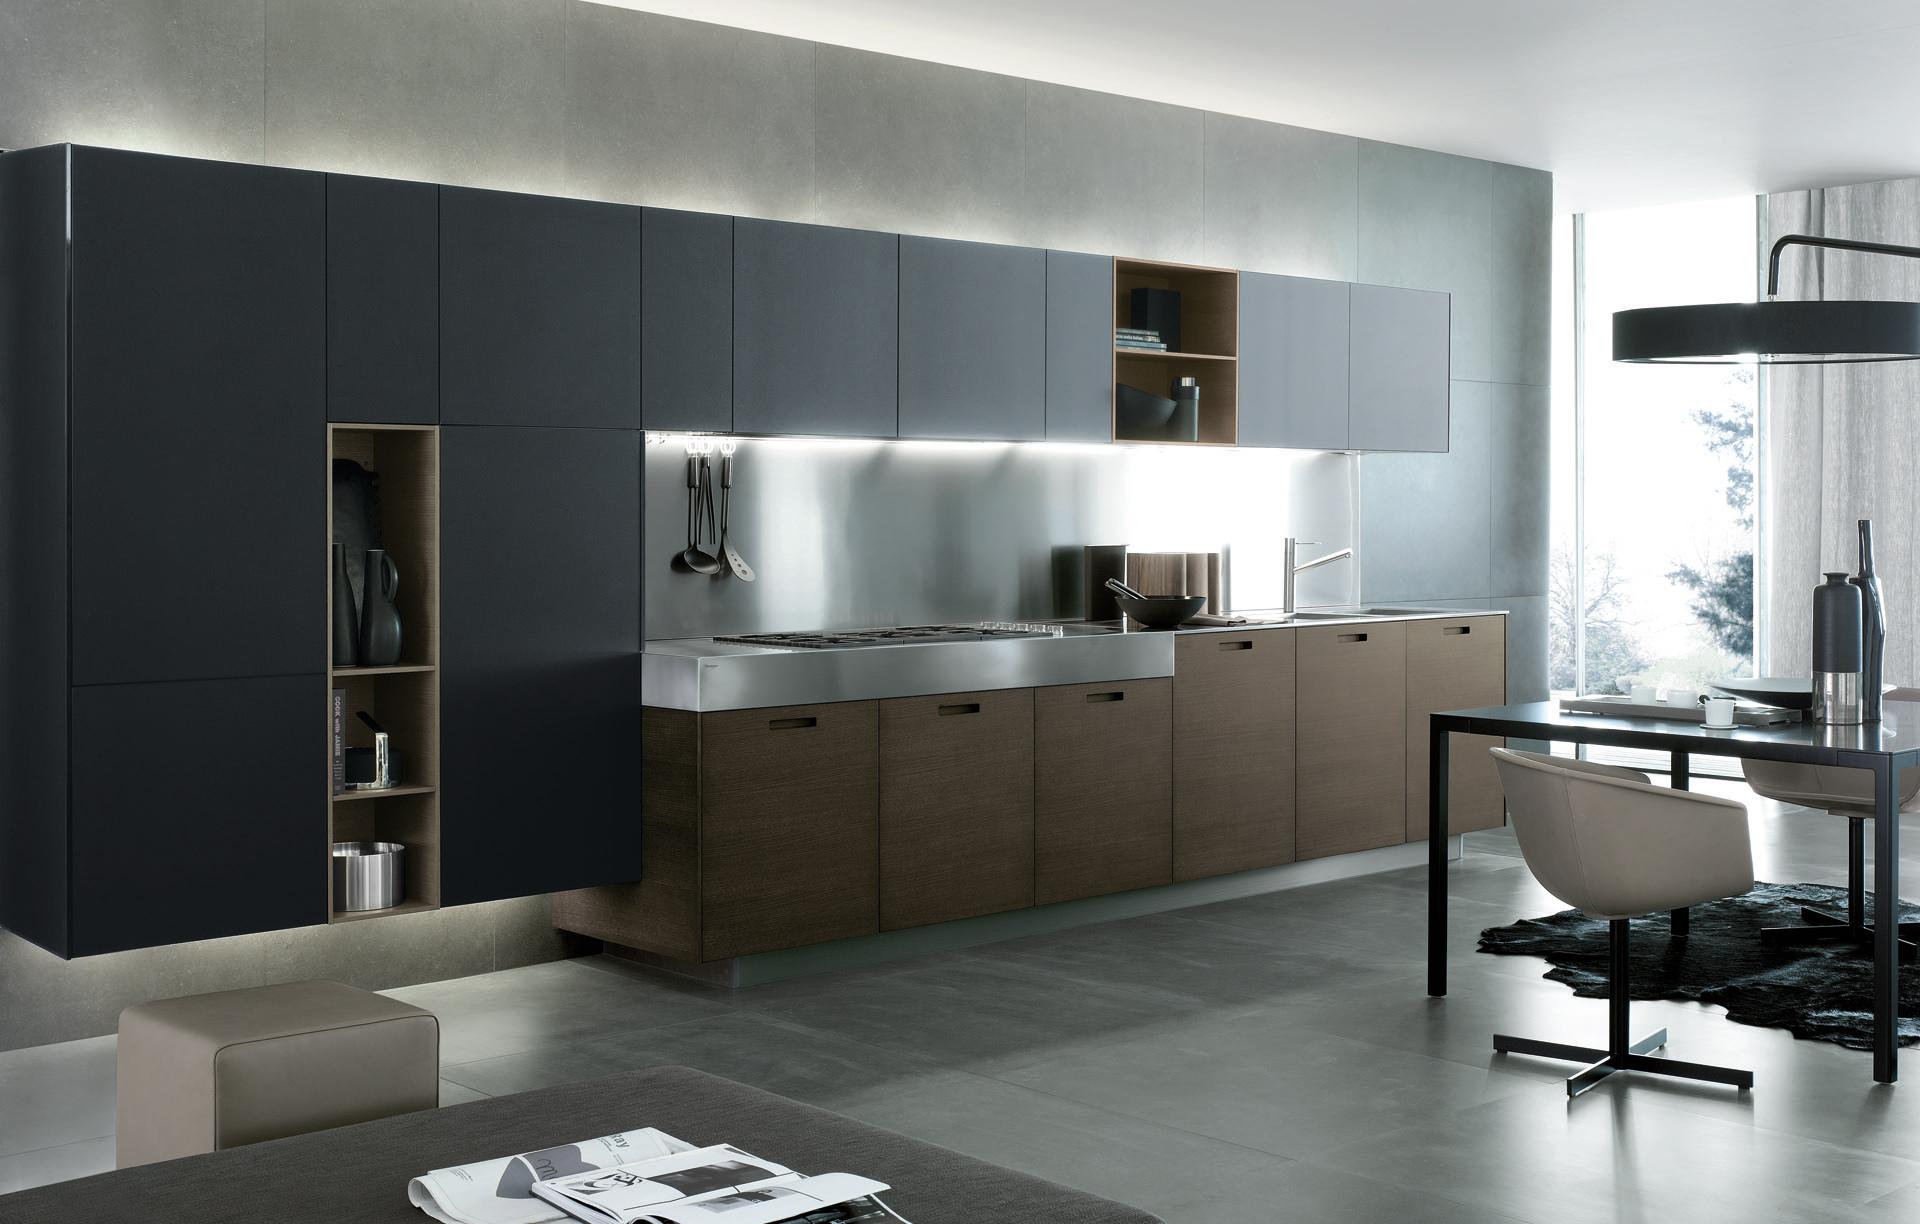 Kyton di varenna cucine arredamento mollura home design for Varenna cuisine